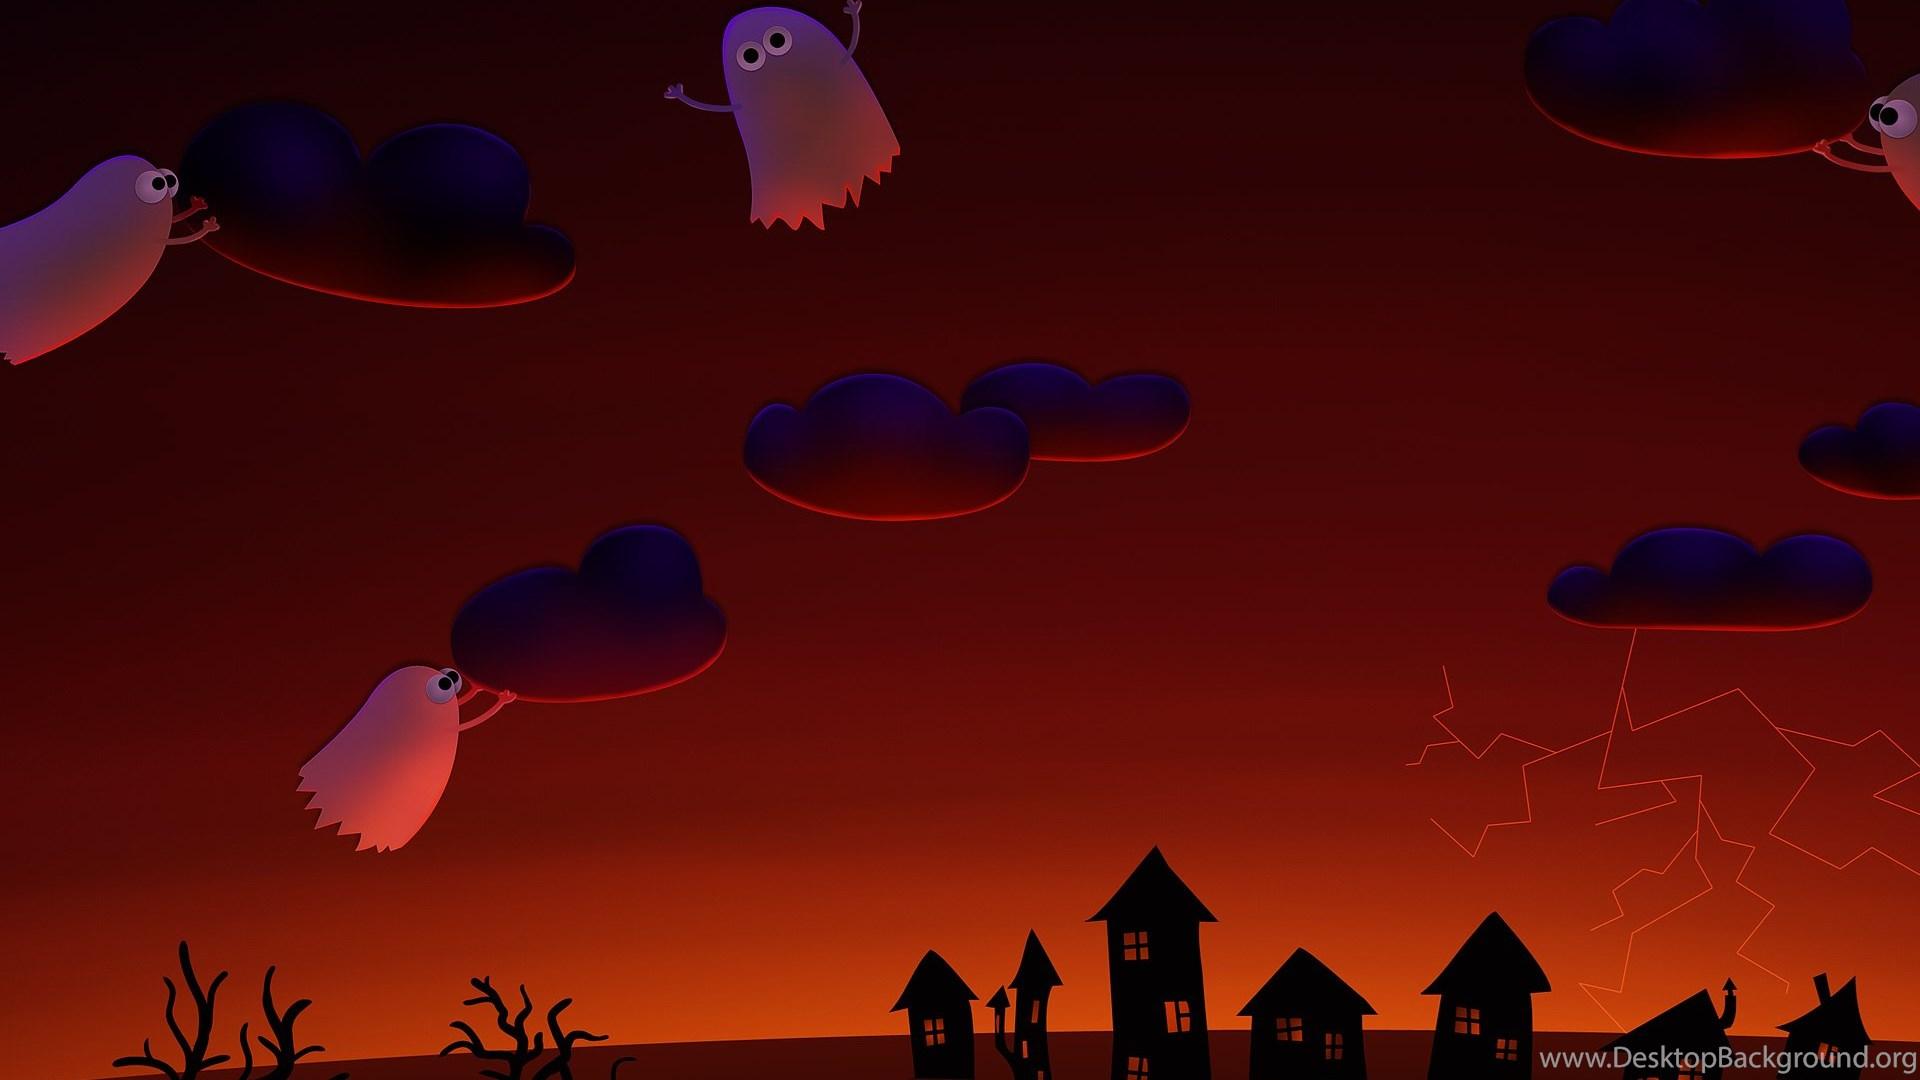 Amazing Wallpaper Halloween Ghost - 1059194_cute-halloween-ghosts-backgrounds-halloween-cute-ghosts-village_1920x1200_h  Photograph_355594.jpg